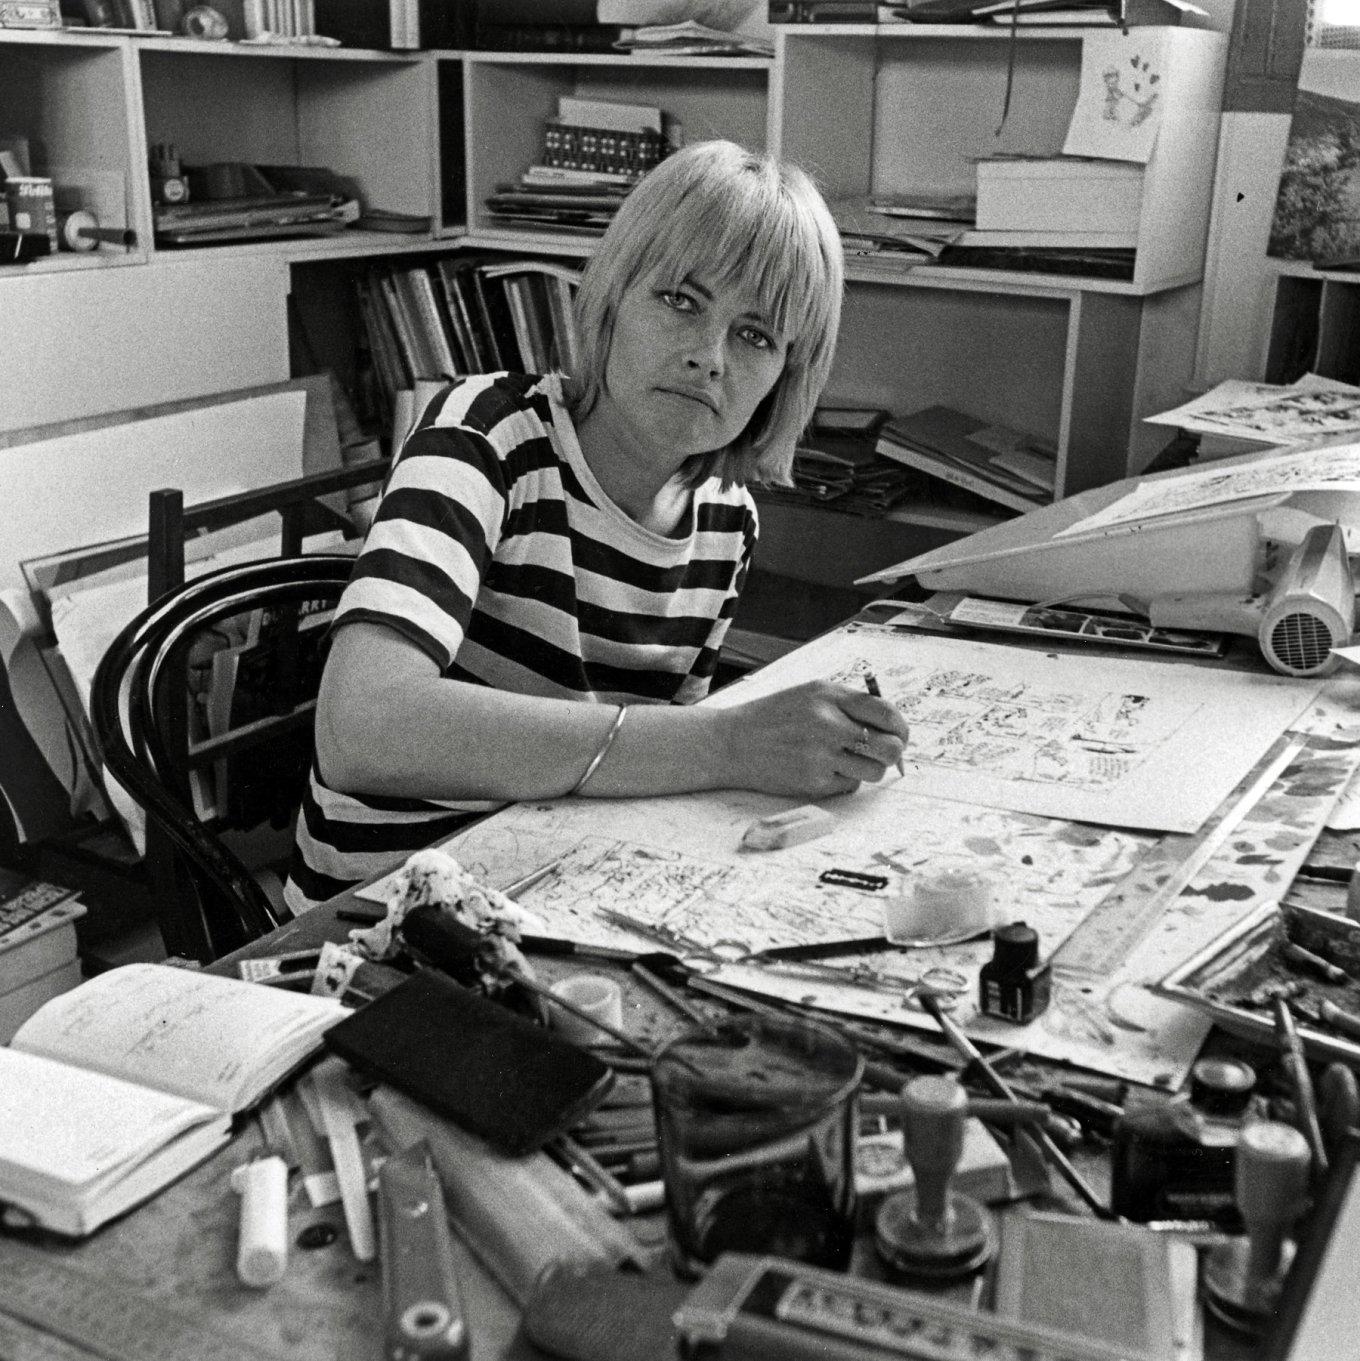 Claire Bretécher in her studio (1979)